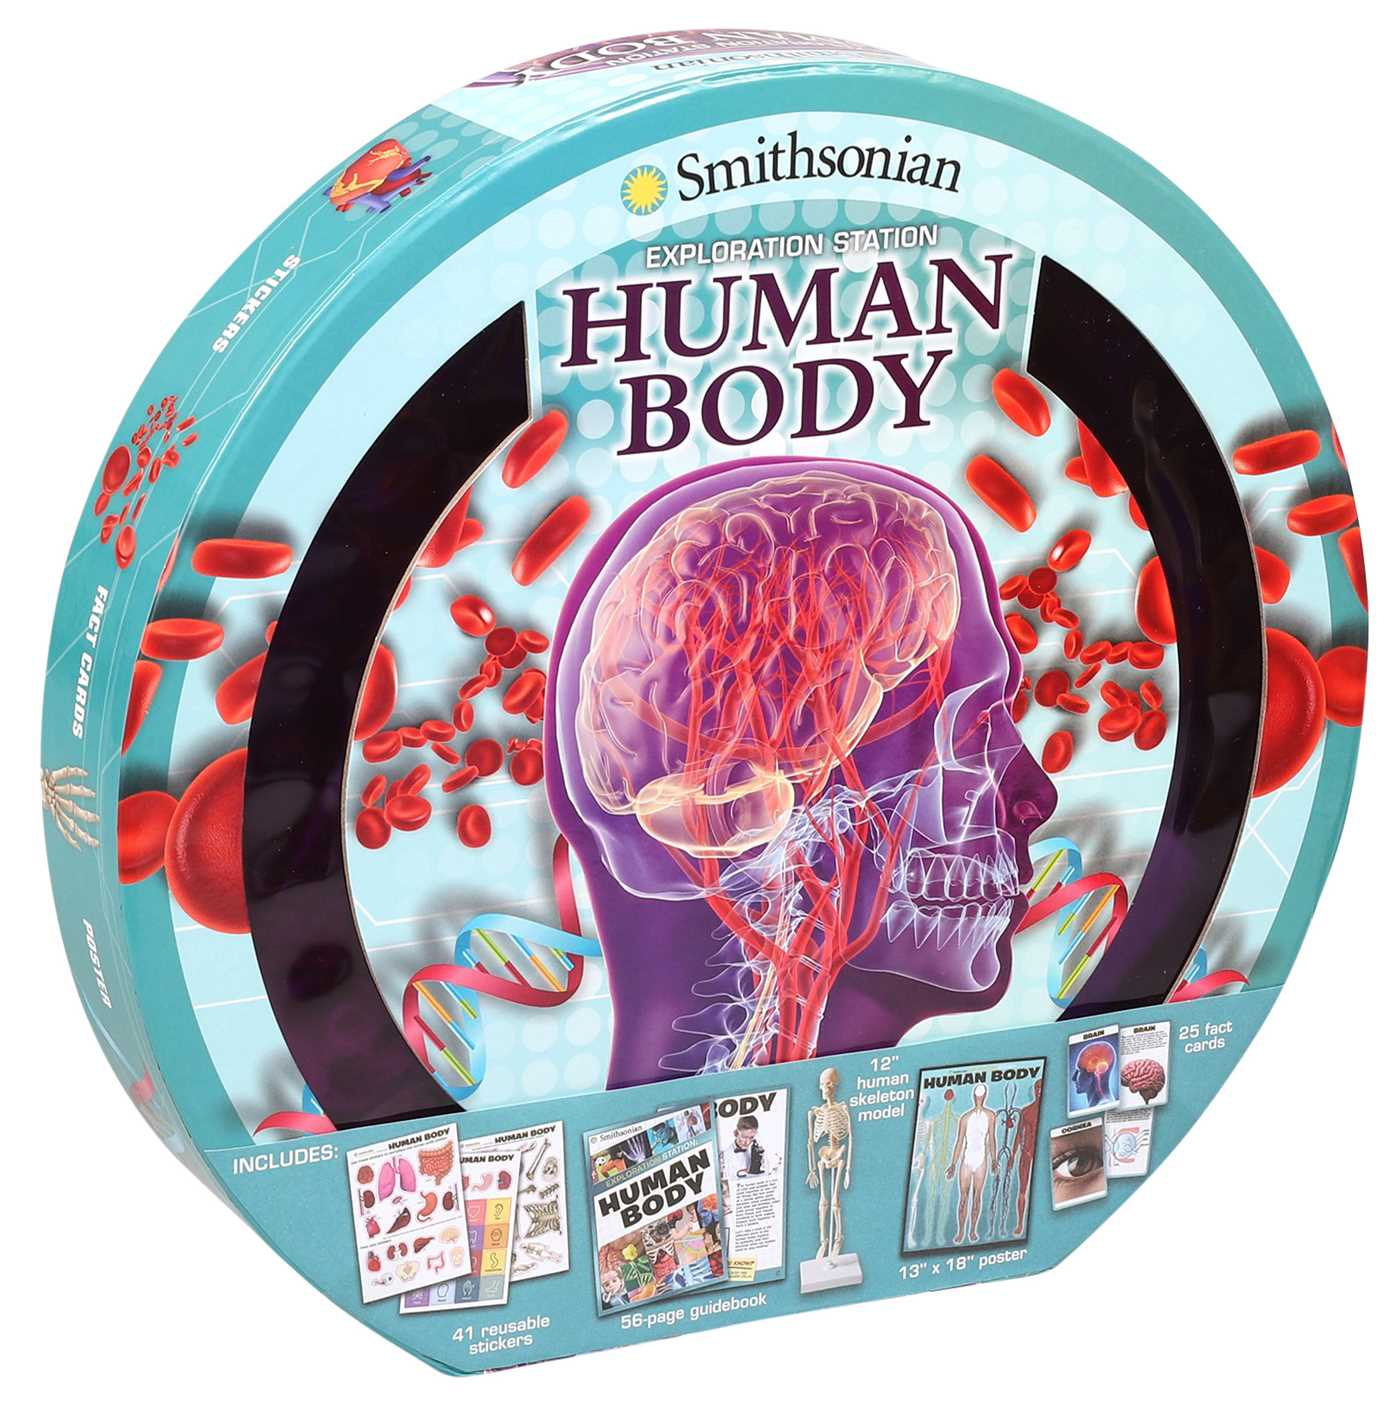 Smithsonian exploration station human body 9781626867215 hr